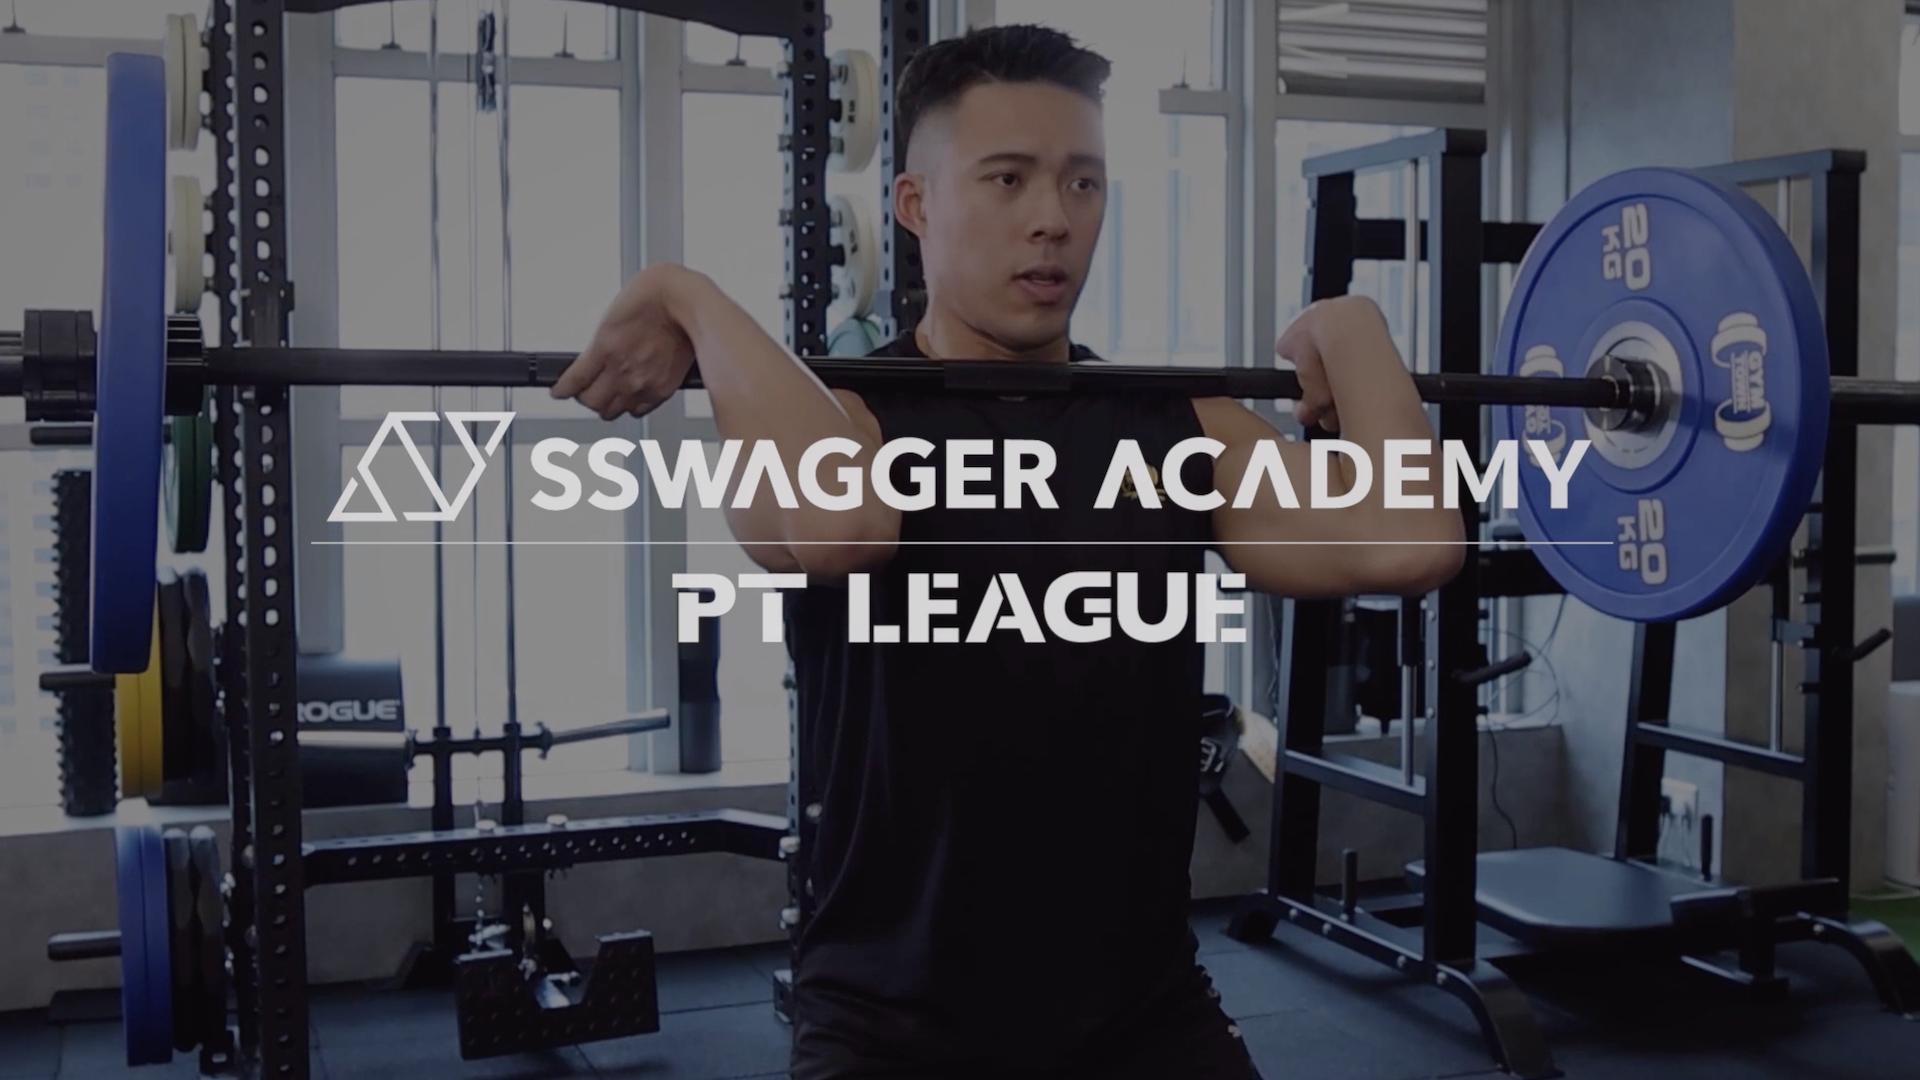 【SSwagger Academy - PT League】#PT聯盟 誕生!與你啟動active lifestyle